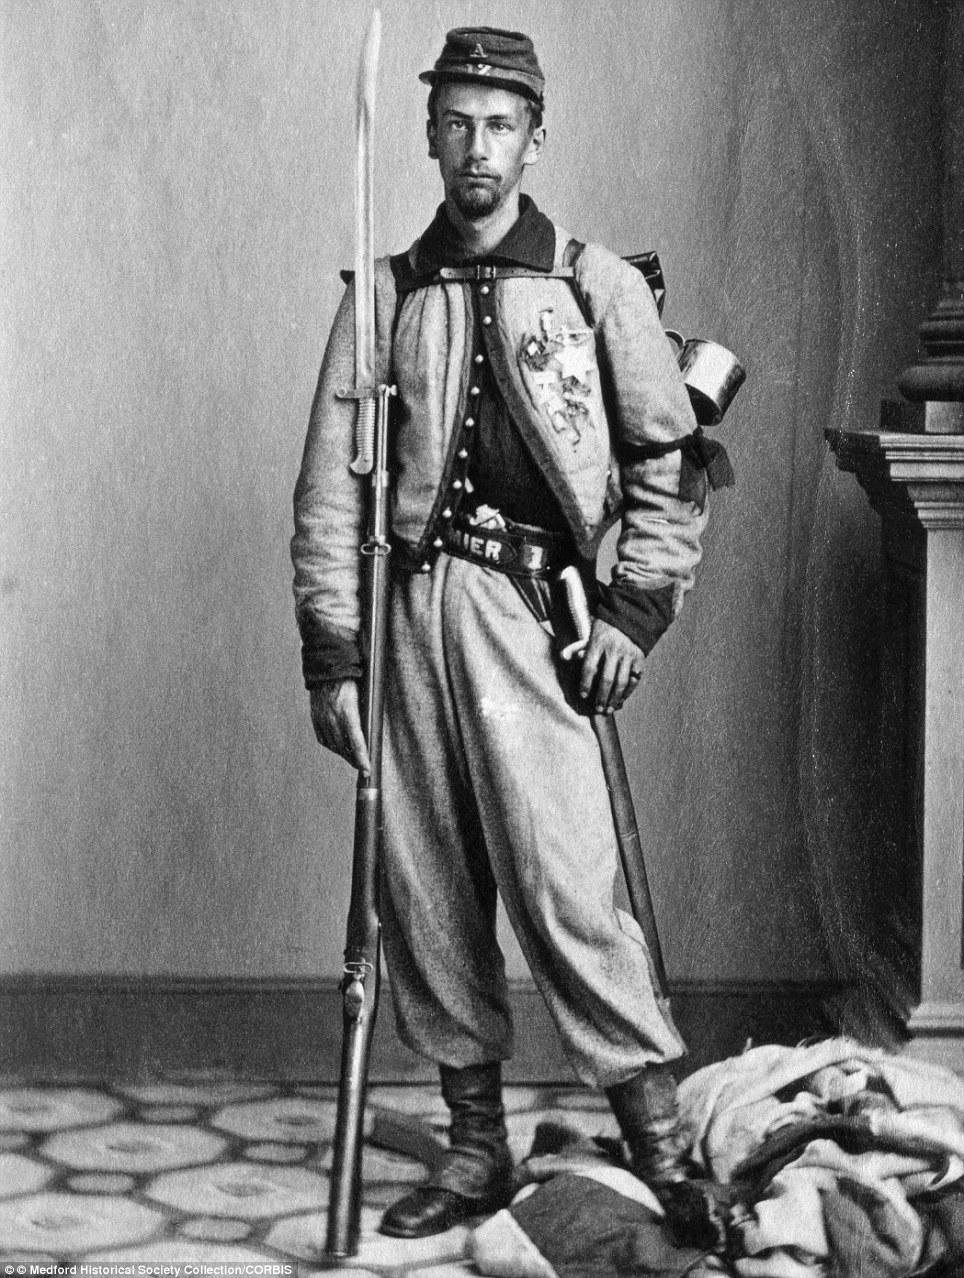 Sergeant Francis Edwin Brownell of 11ny Ellsworth gyilkosának gyilkosa.jpg